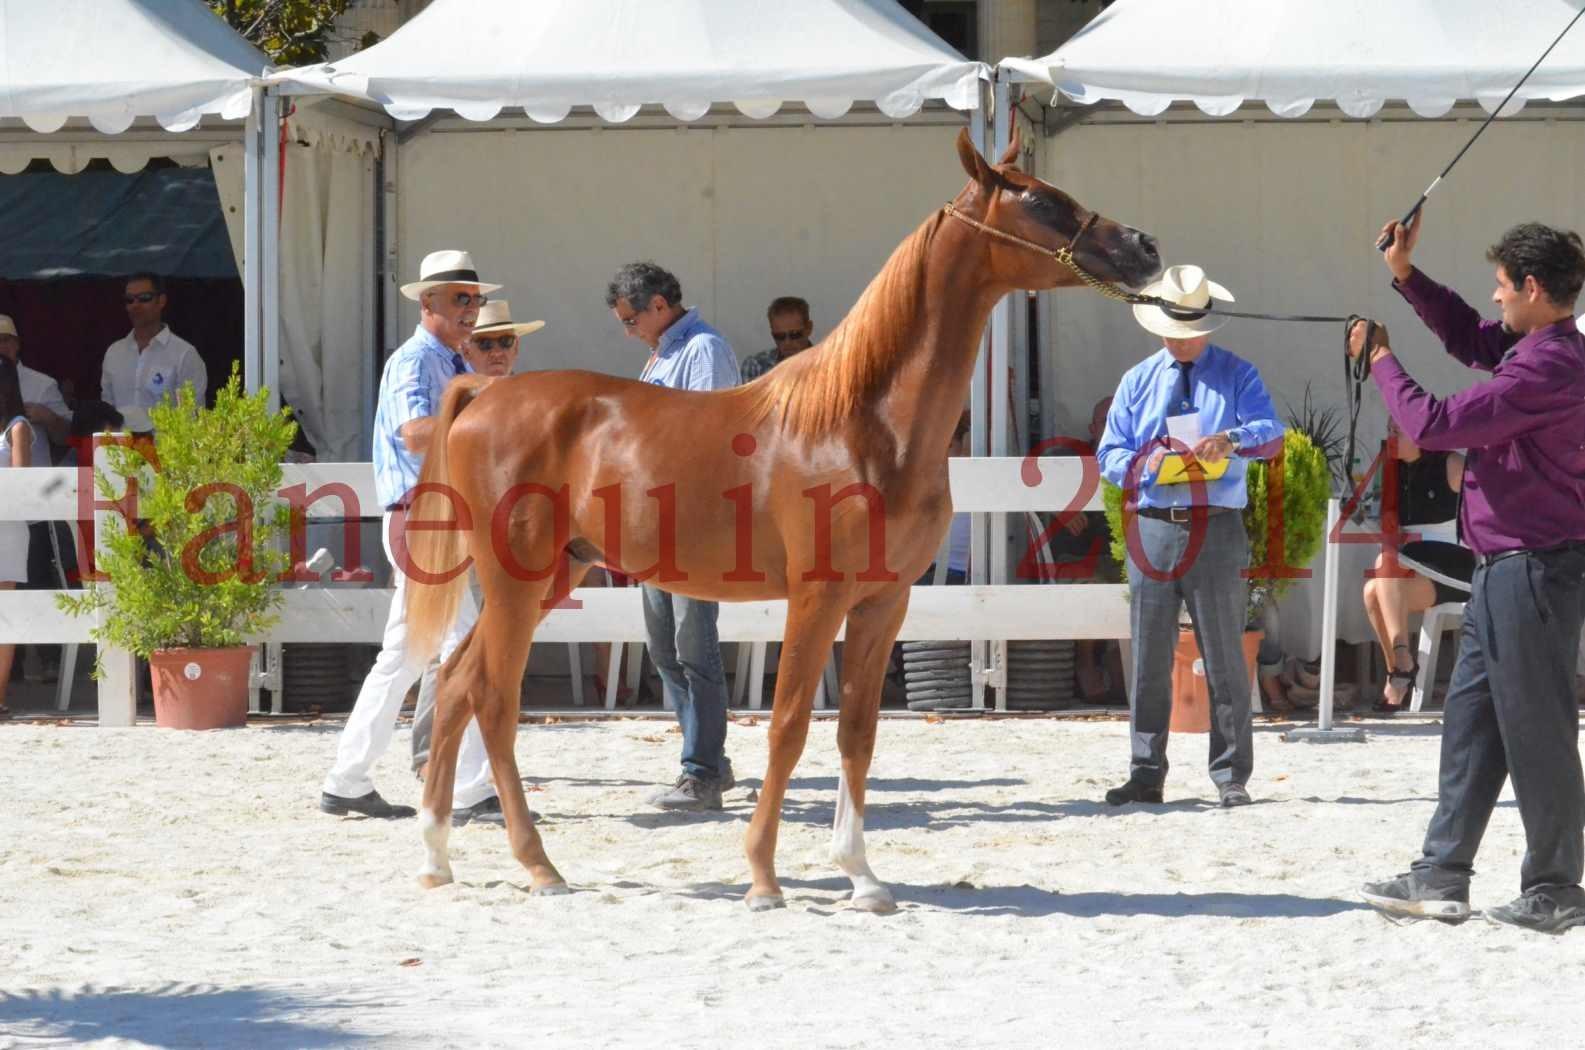 Concours National de Nîmes de chevaux ARABES 2014 - TSAR NERIO - 23